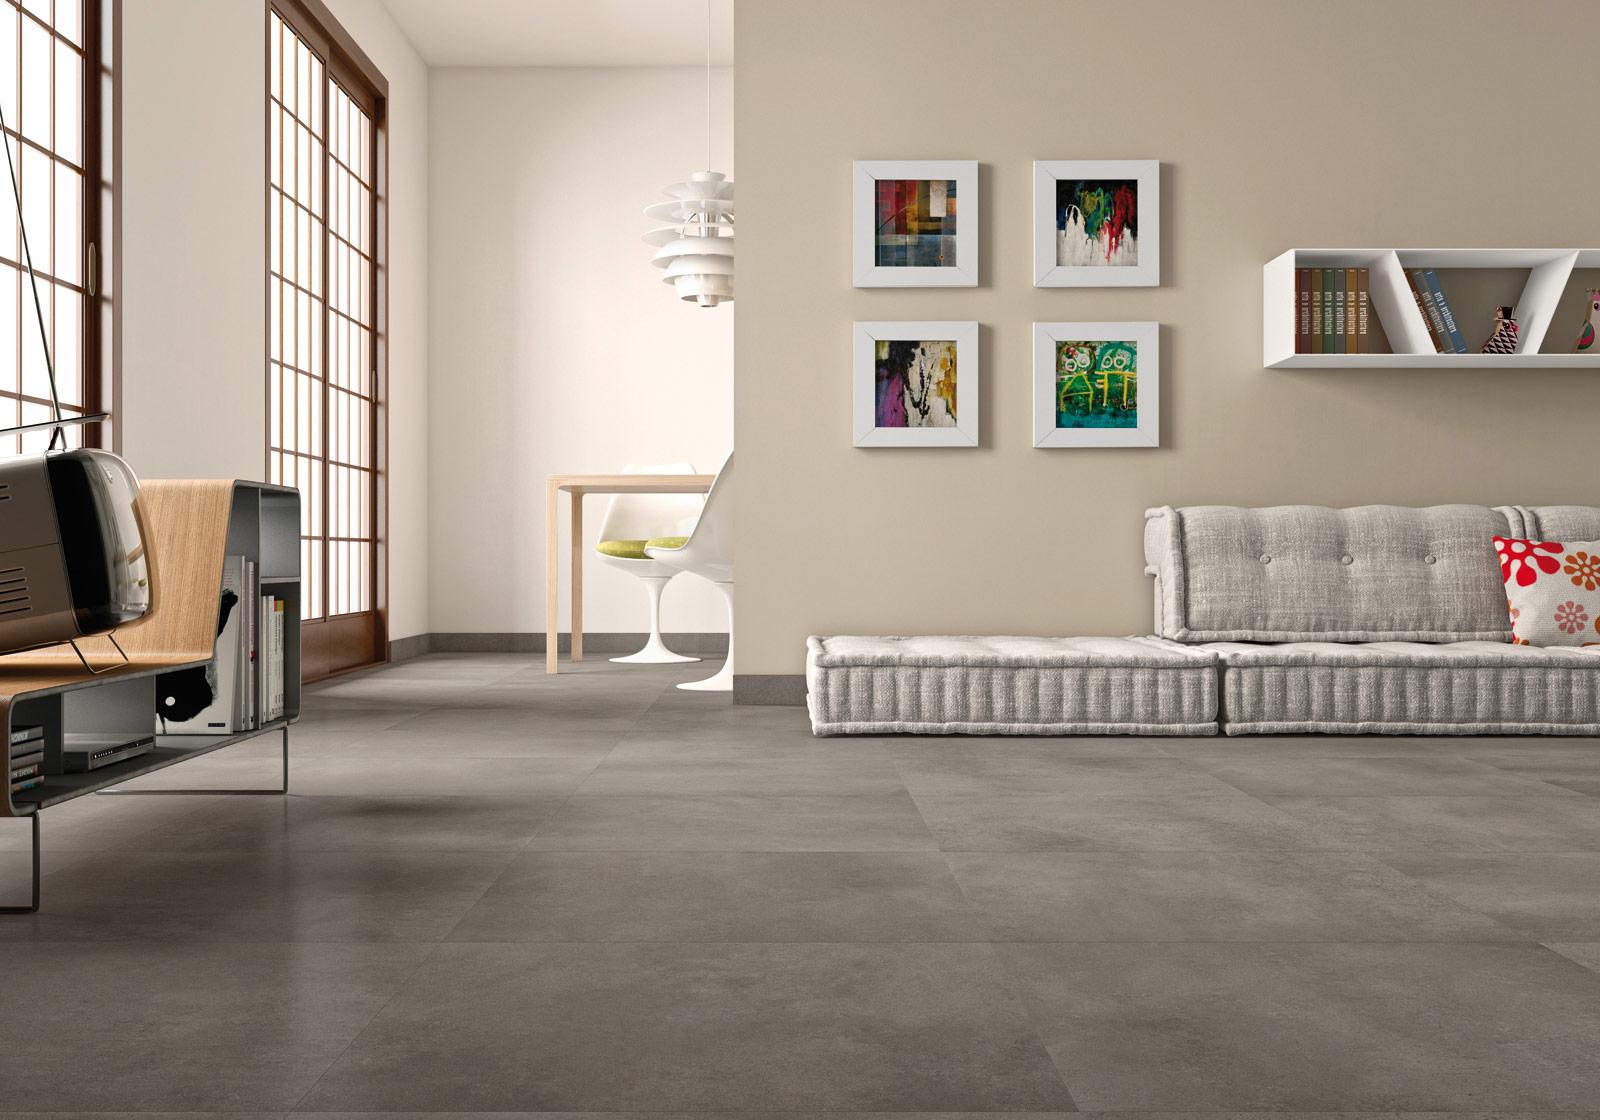 Denver Pavimento Effetto Cemento Sala Da Pranzo E Ristoranti #B31822 1600 1120 Sala Da Pranzo Parquet